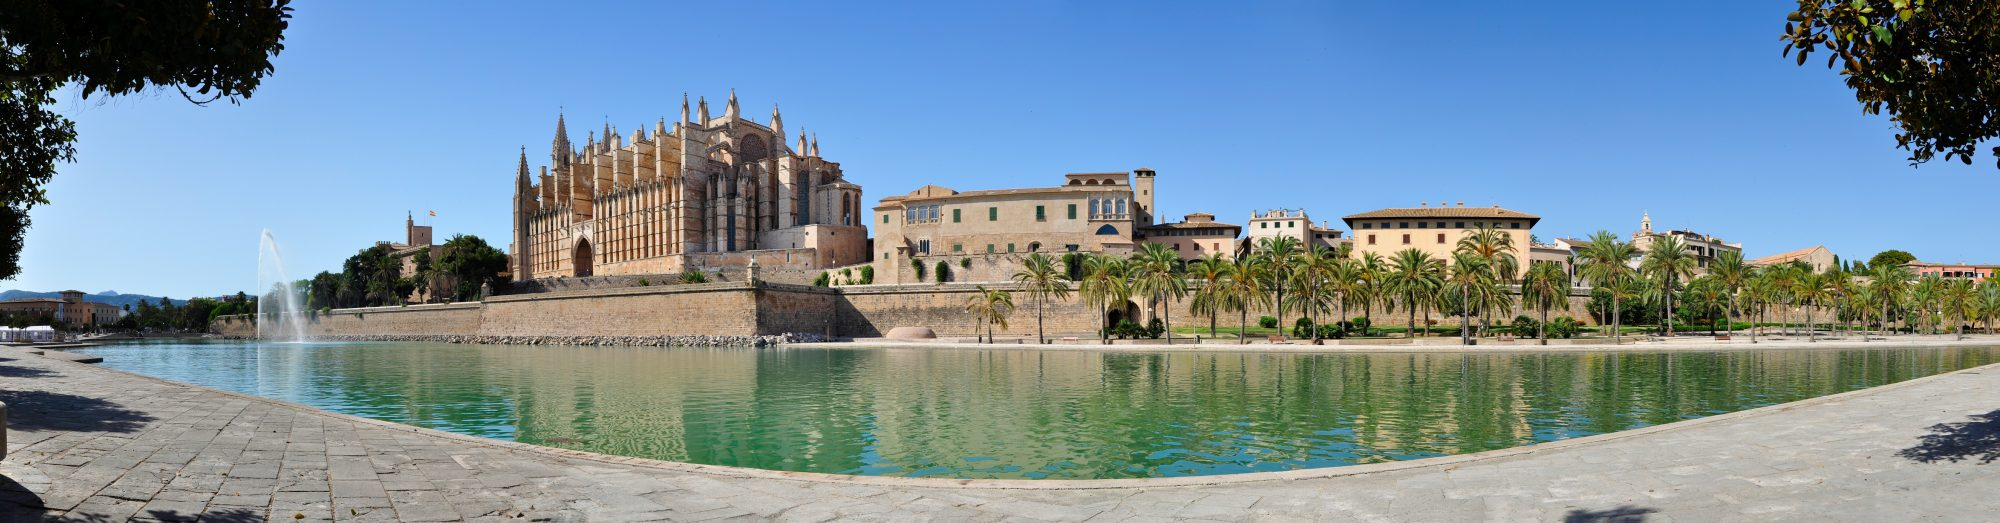 Mallorca Cathedral Panorama